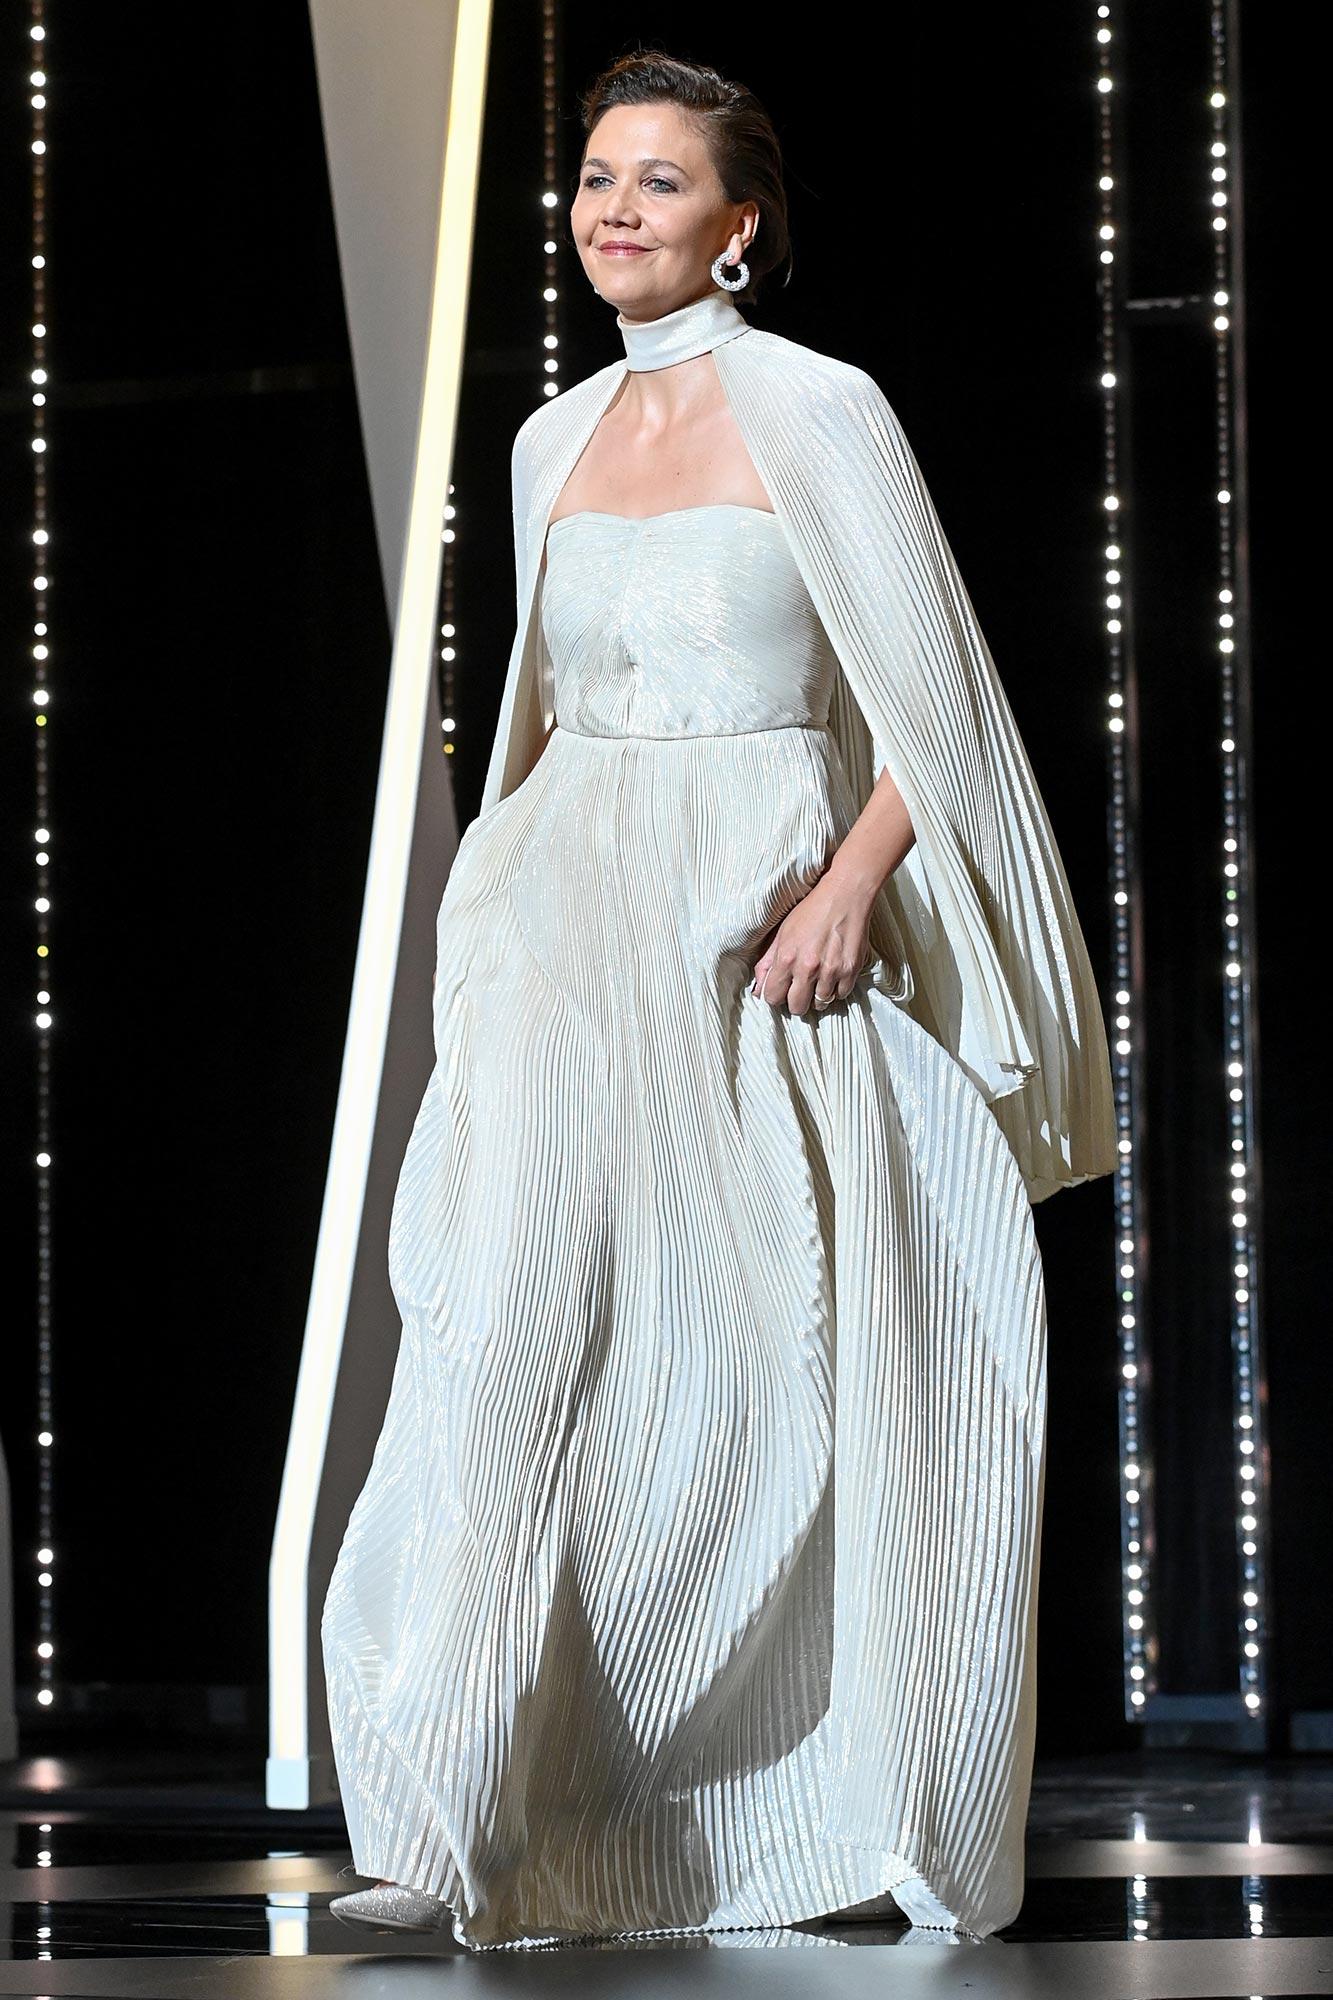 Cannes 2021 Red Carpet - Maggie Gyllenhaal